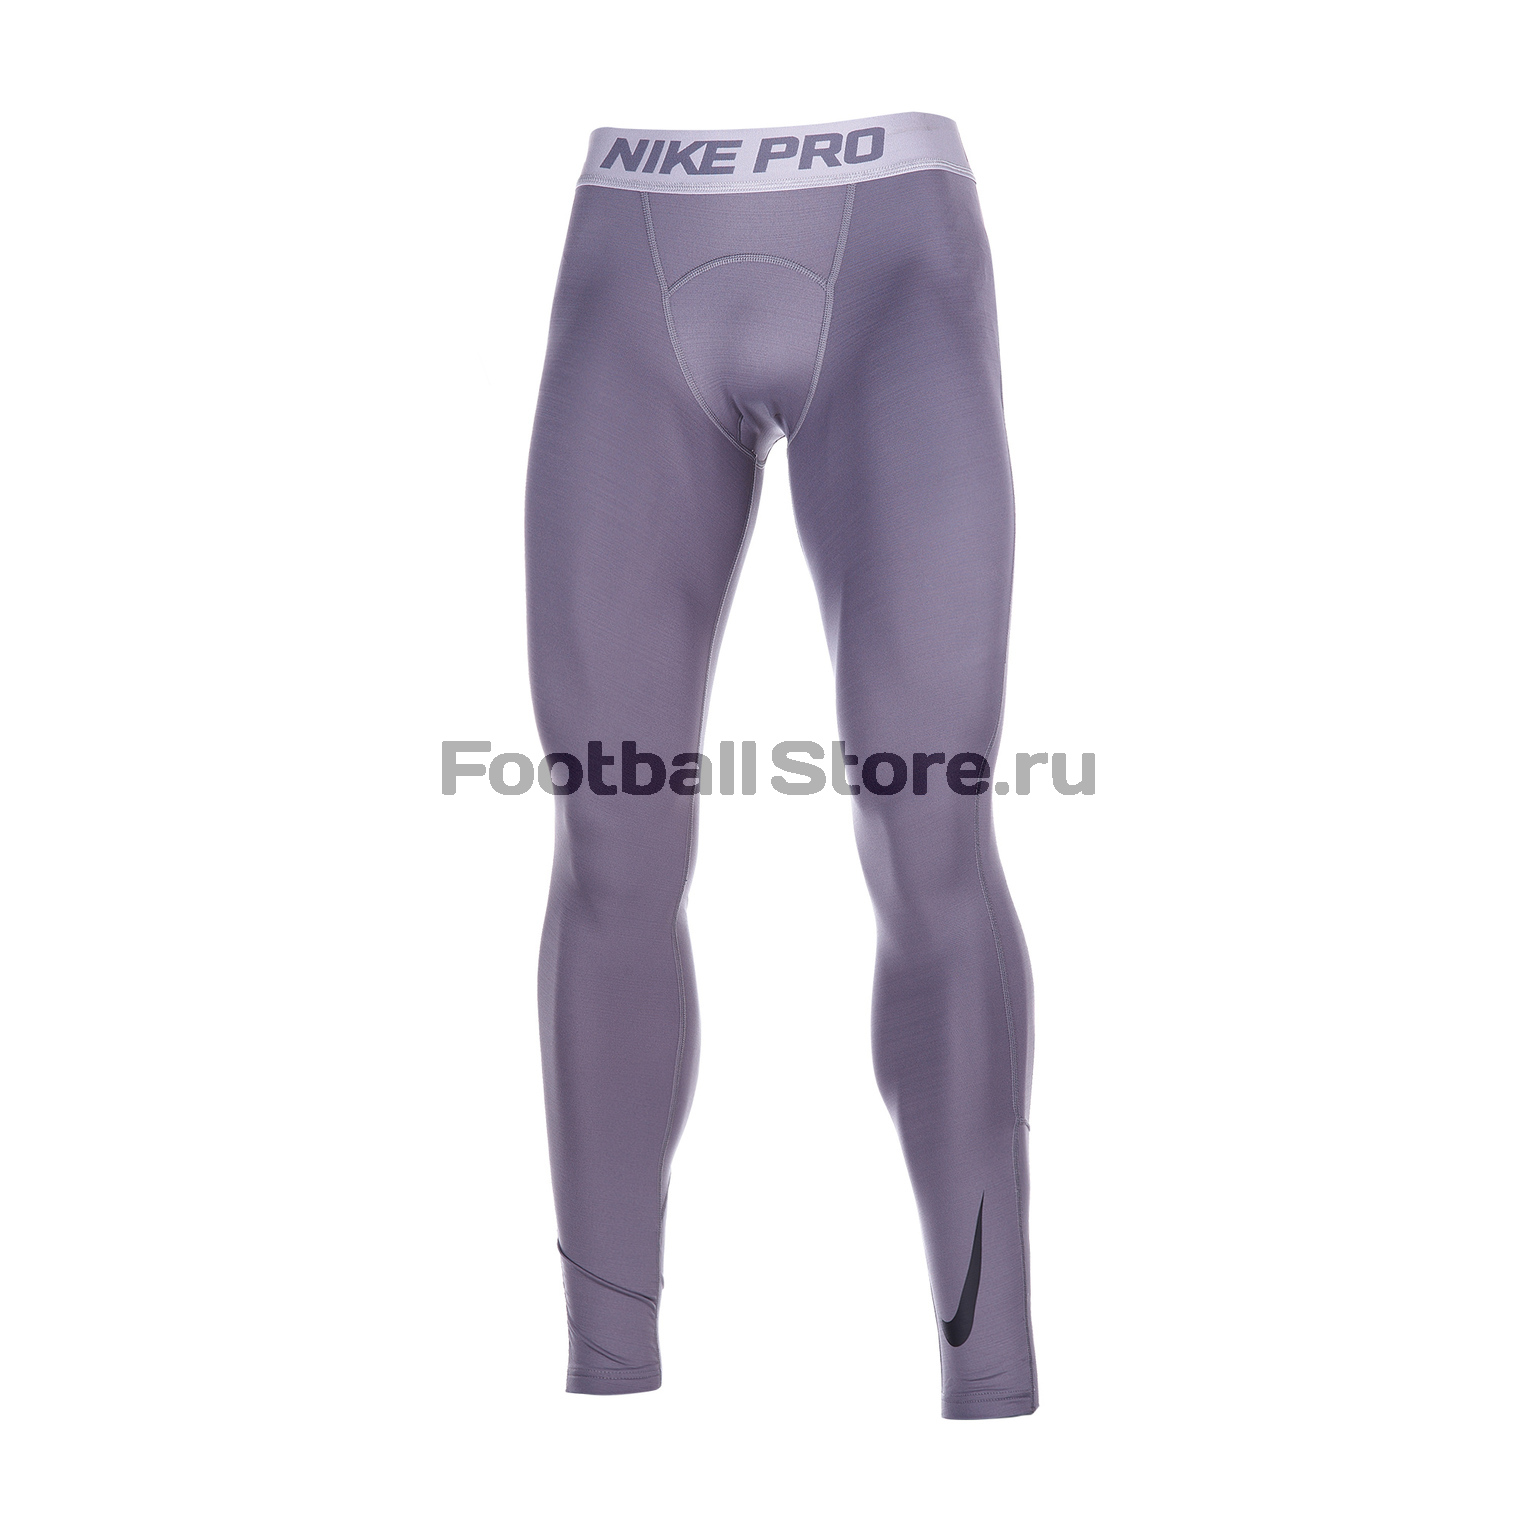 Белье лосины Nike Therma 929711-036 нижнее белье nike 654876 341 pro combat